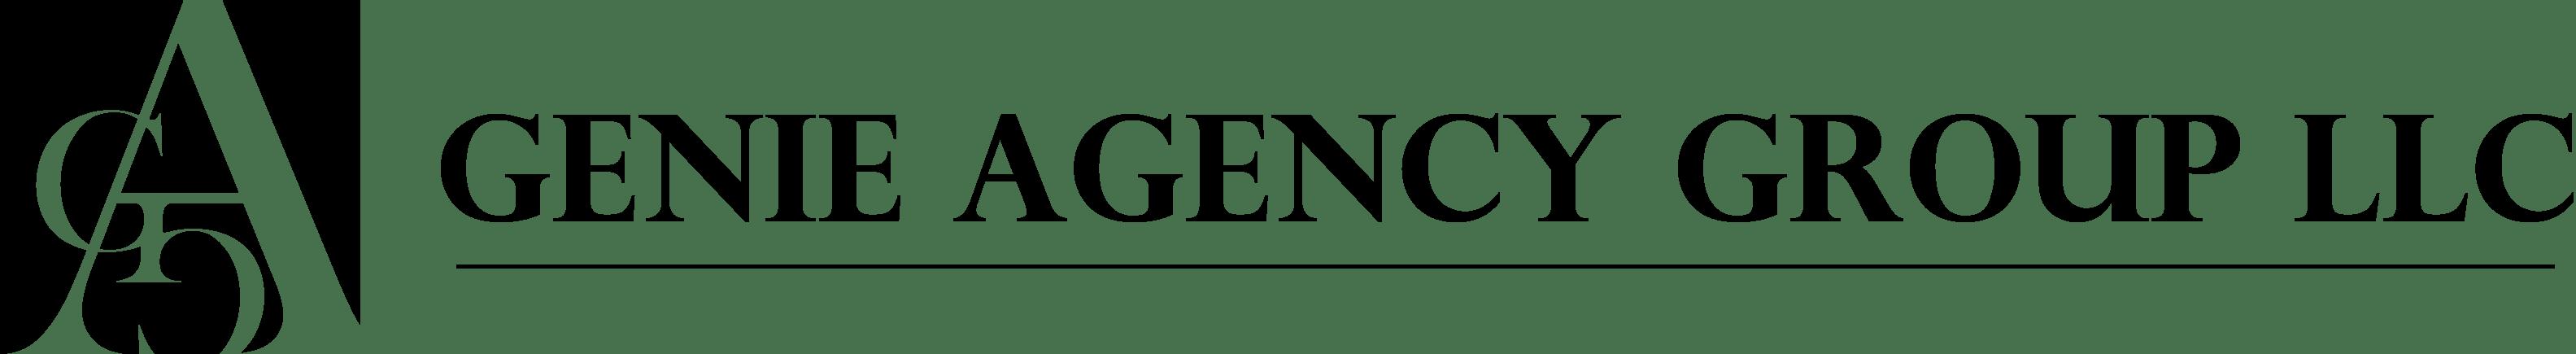 Genie Agency Group LLC